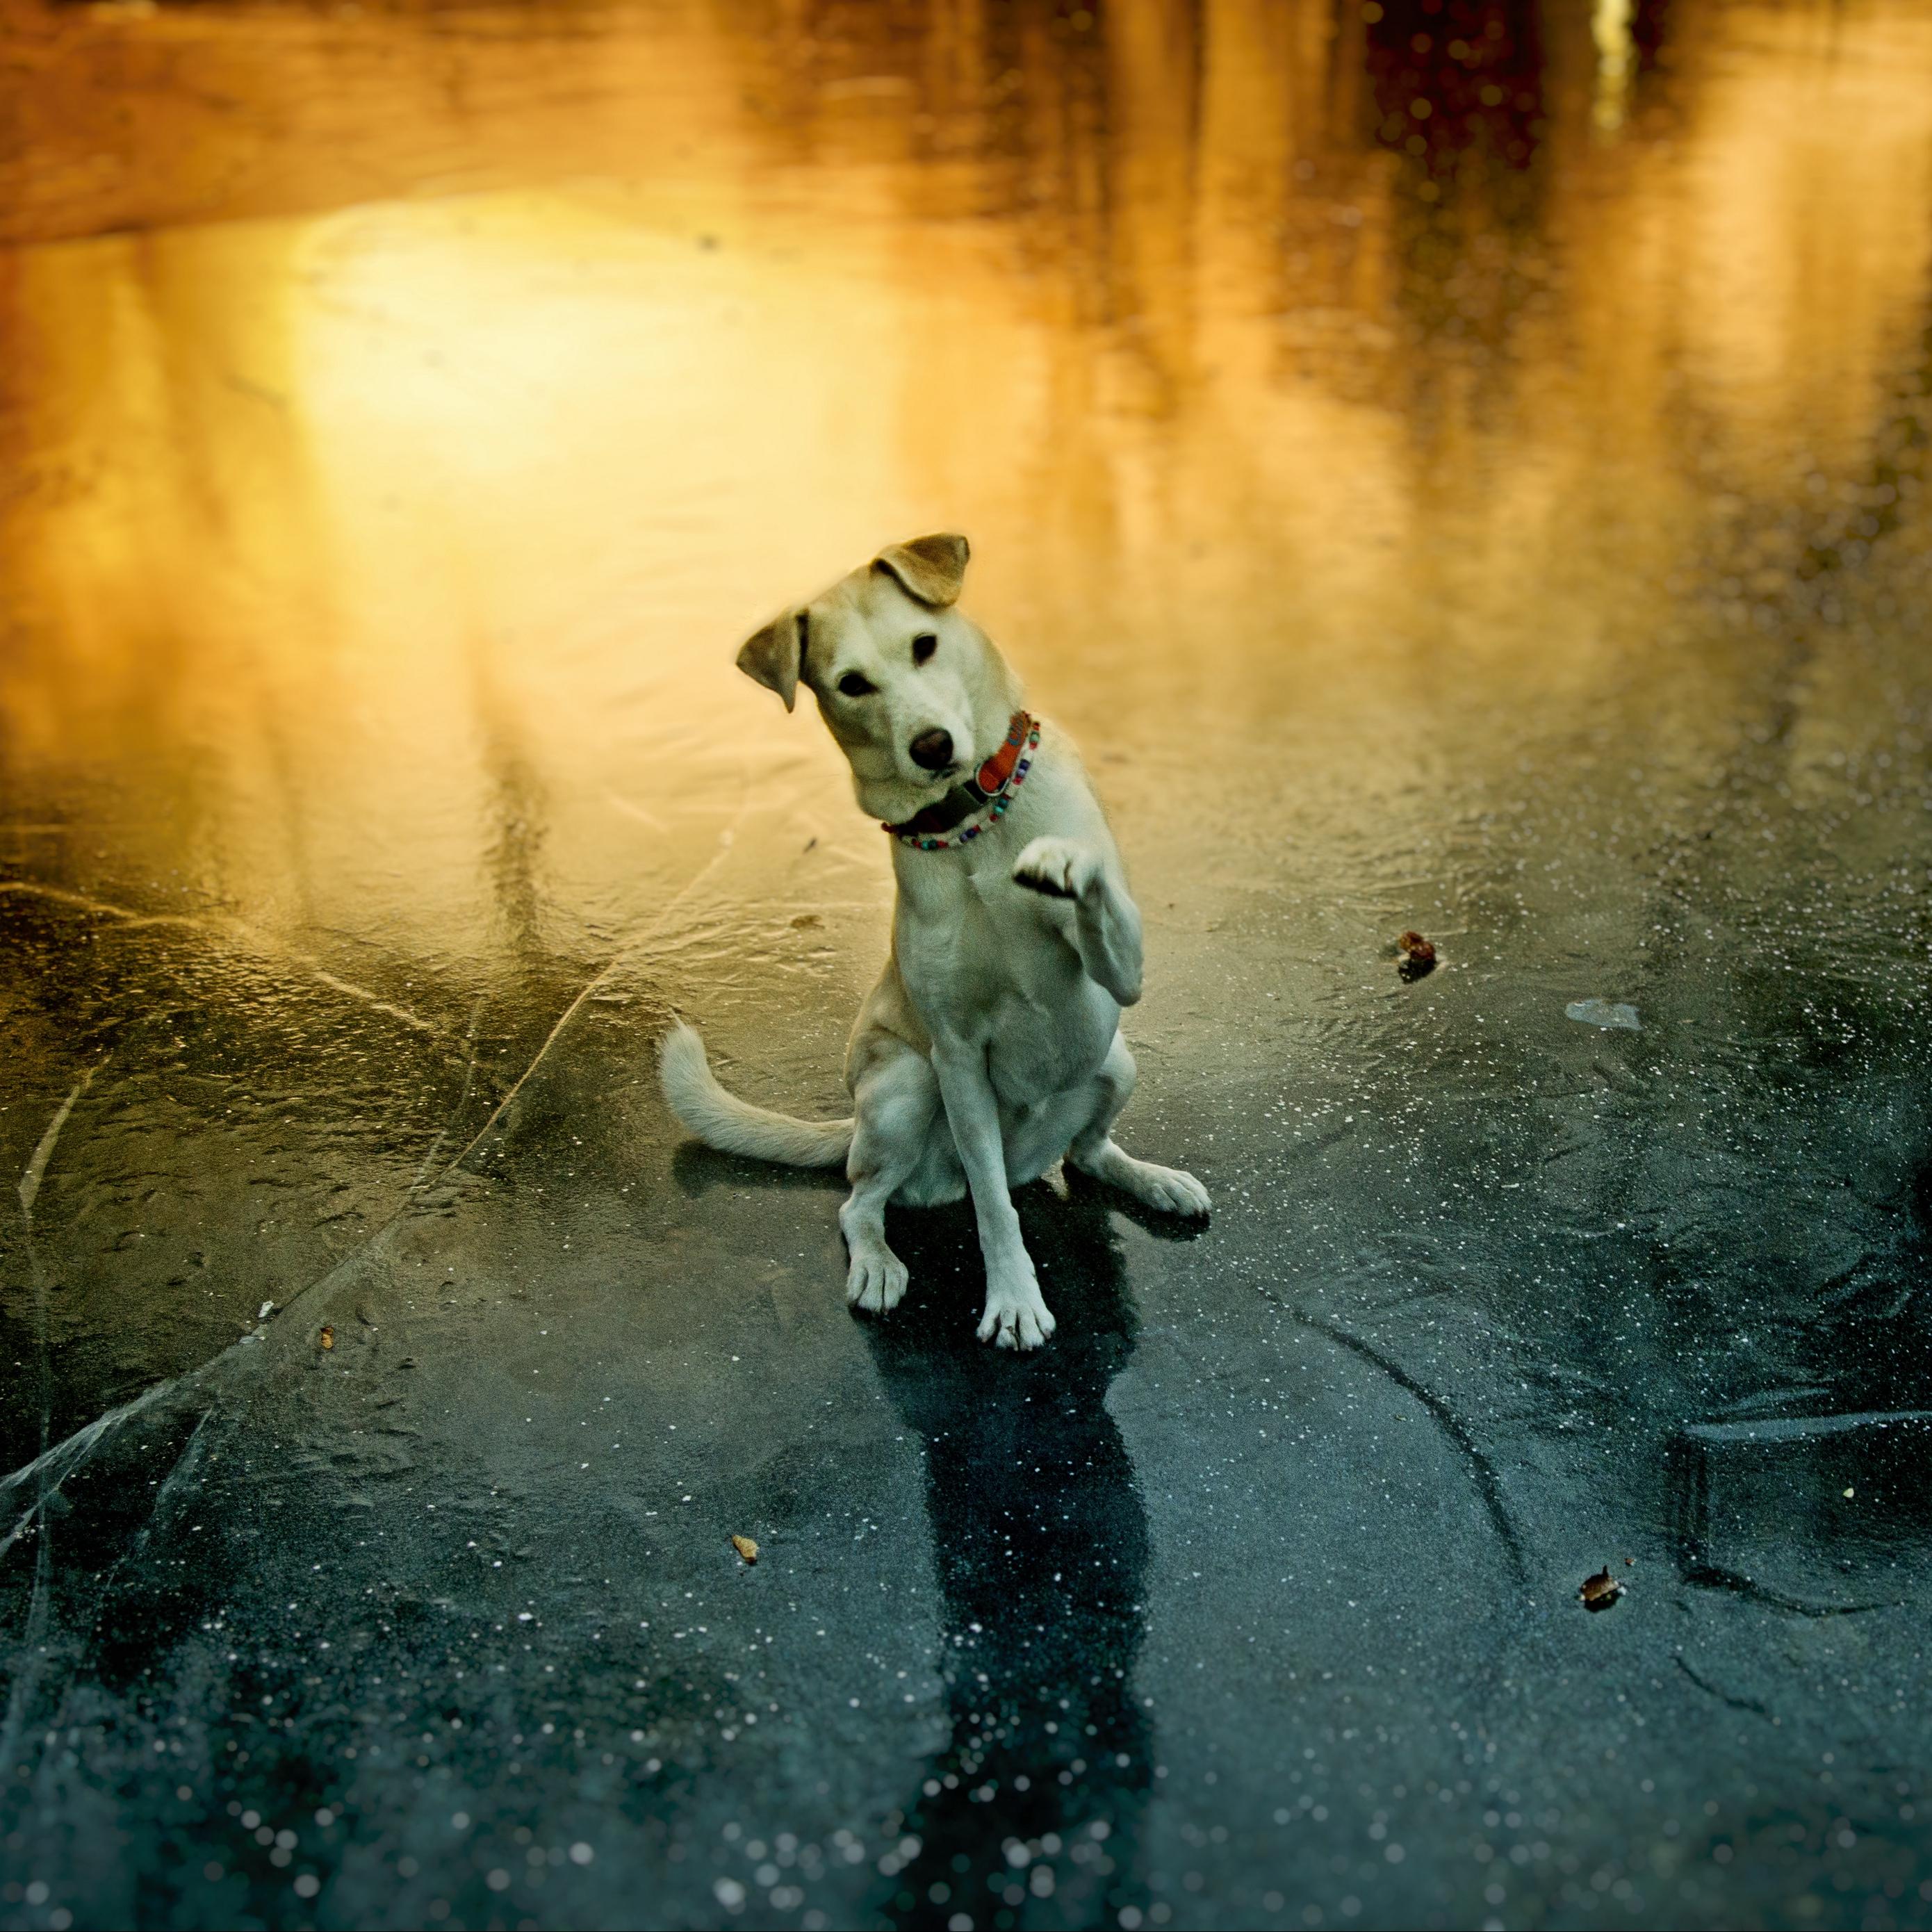 Download wallpaper 2780x2780 dog paw pet funny playful ipad 2780x2780